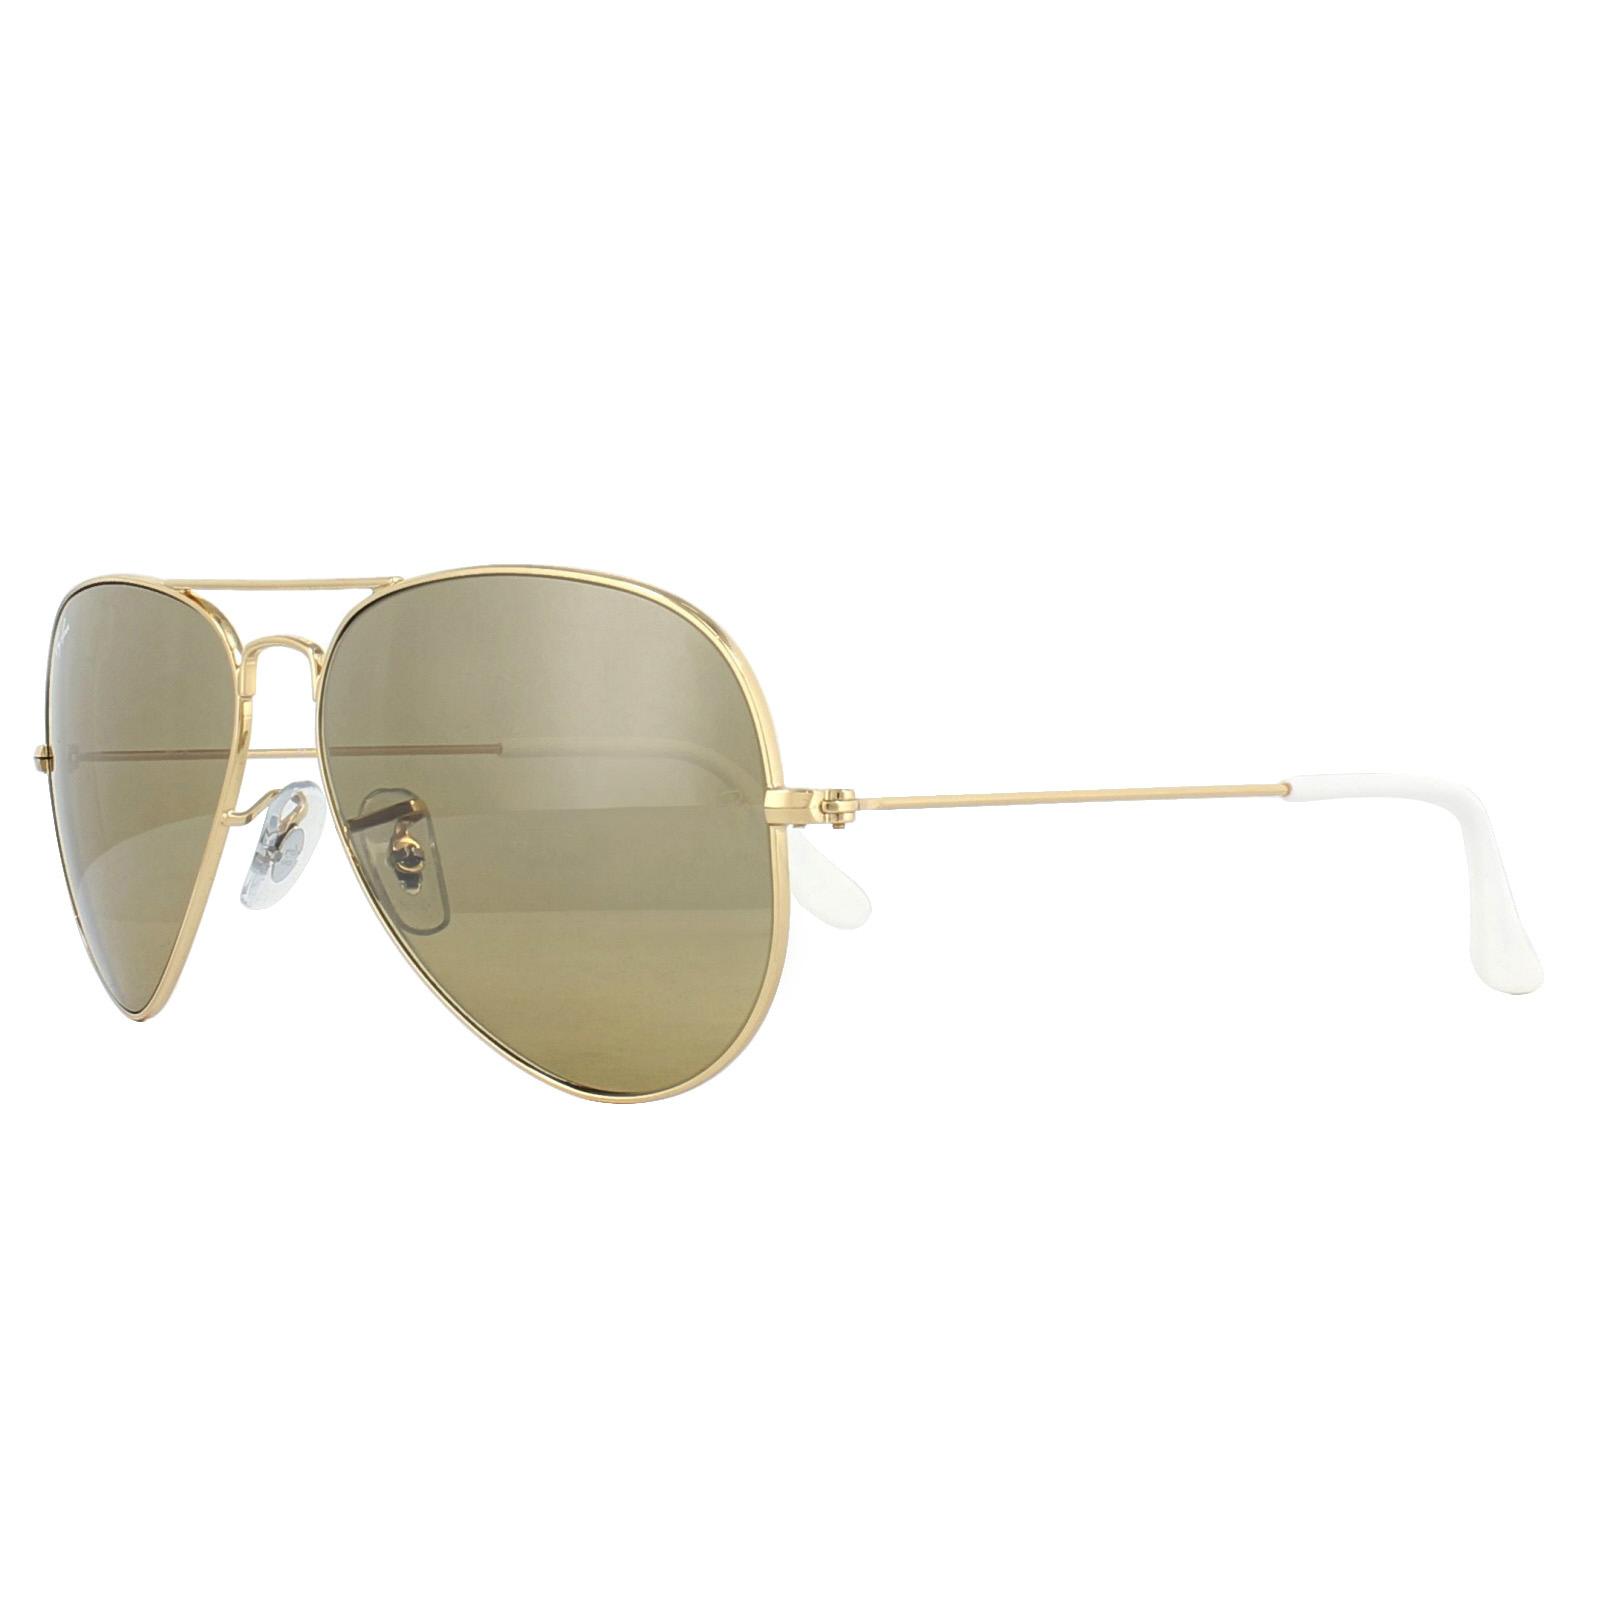 6f21f161dd549 CENTINELA Ray-Ban gafas de sol Aviator 3025 espejo marrón oro plata K 03 01